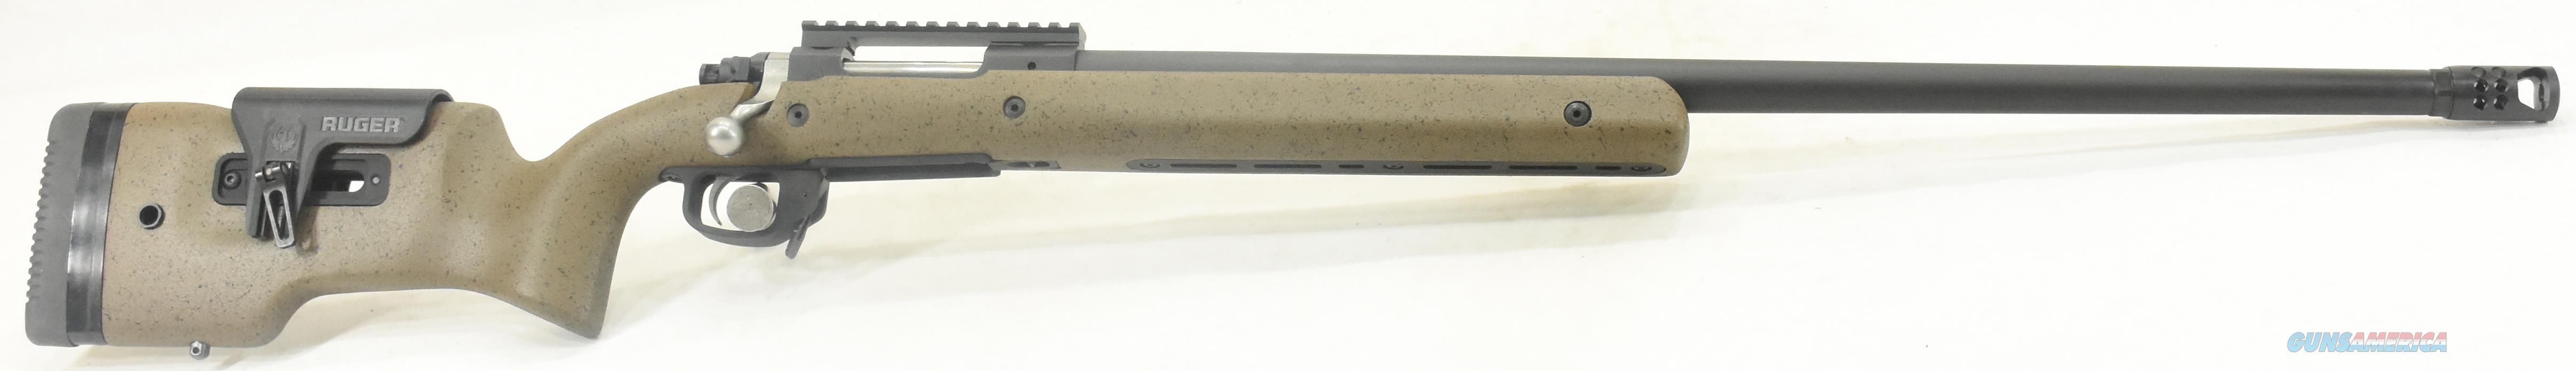 Hawkeye Long Range Target 6.5CM 26In  47184  Guns > Pistols > S Misc Pistols